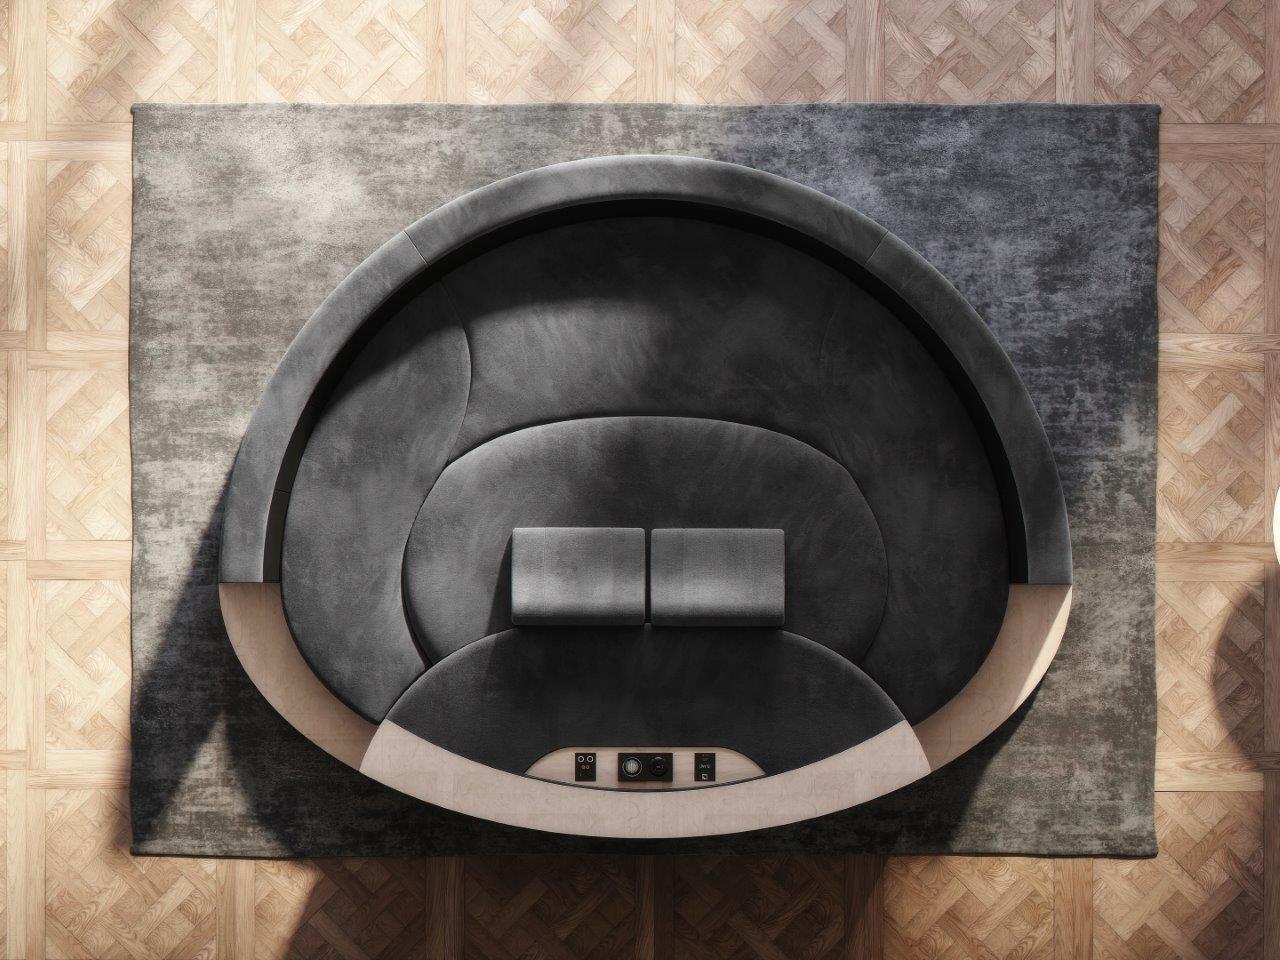 L-Acoustics Creations' Island Prestige Is Luxury 'Personal Auditorium'